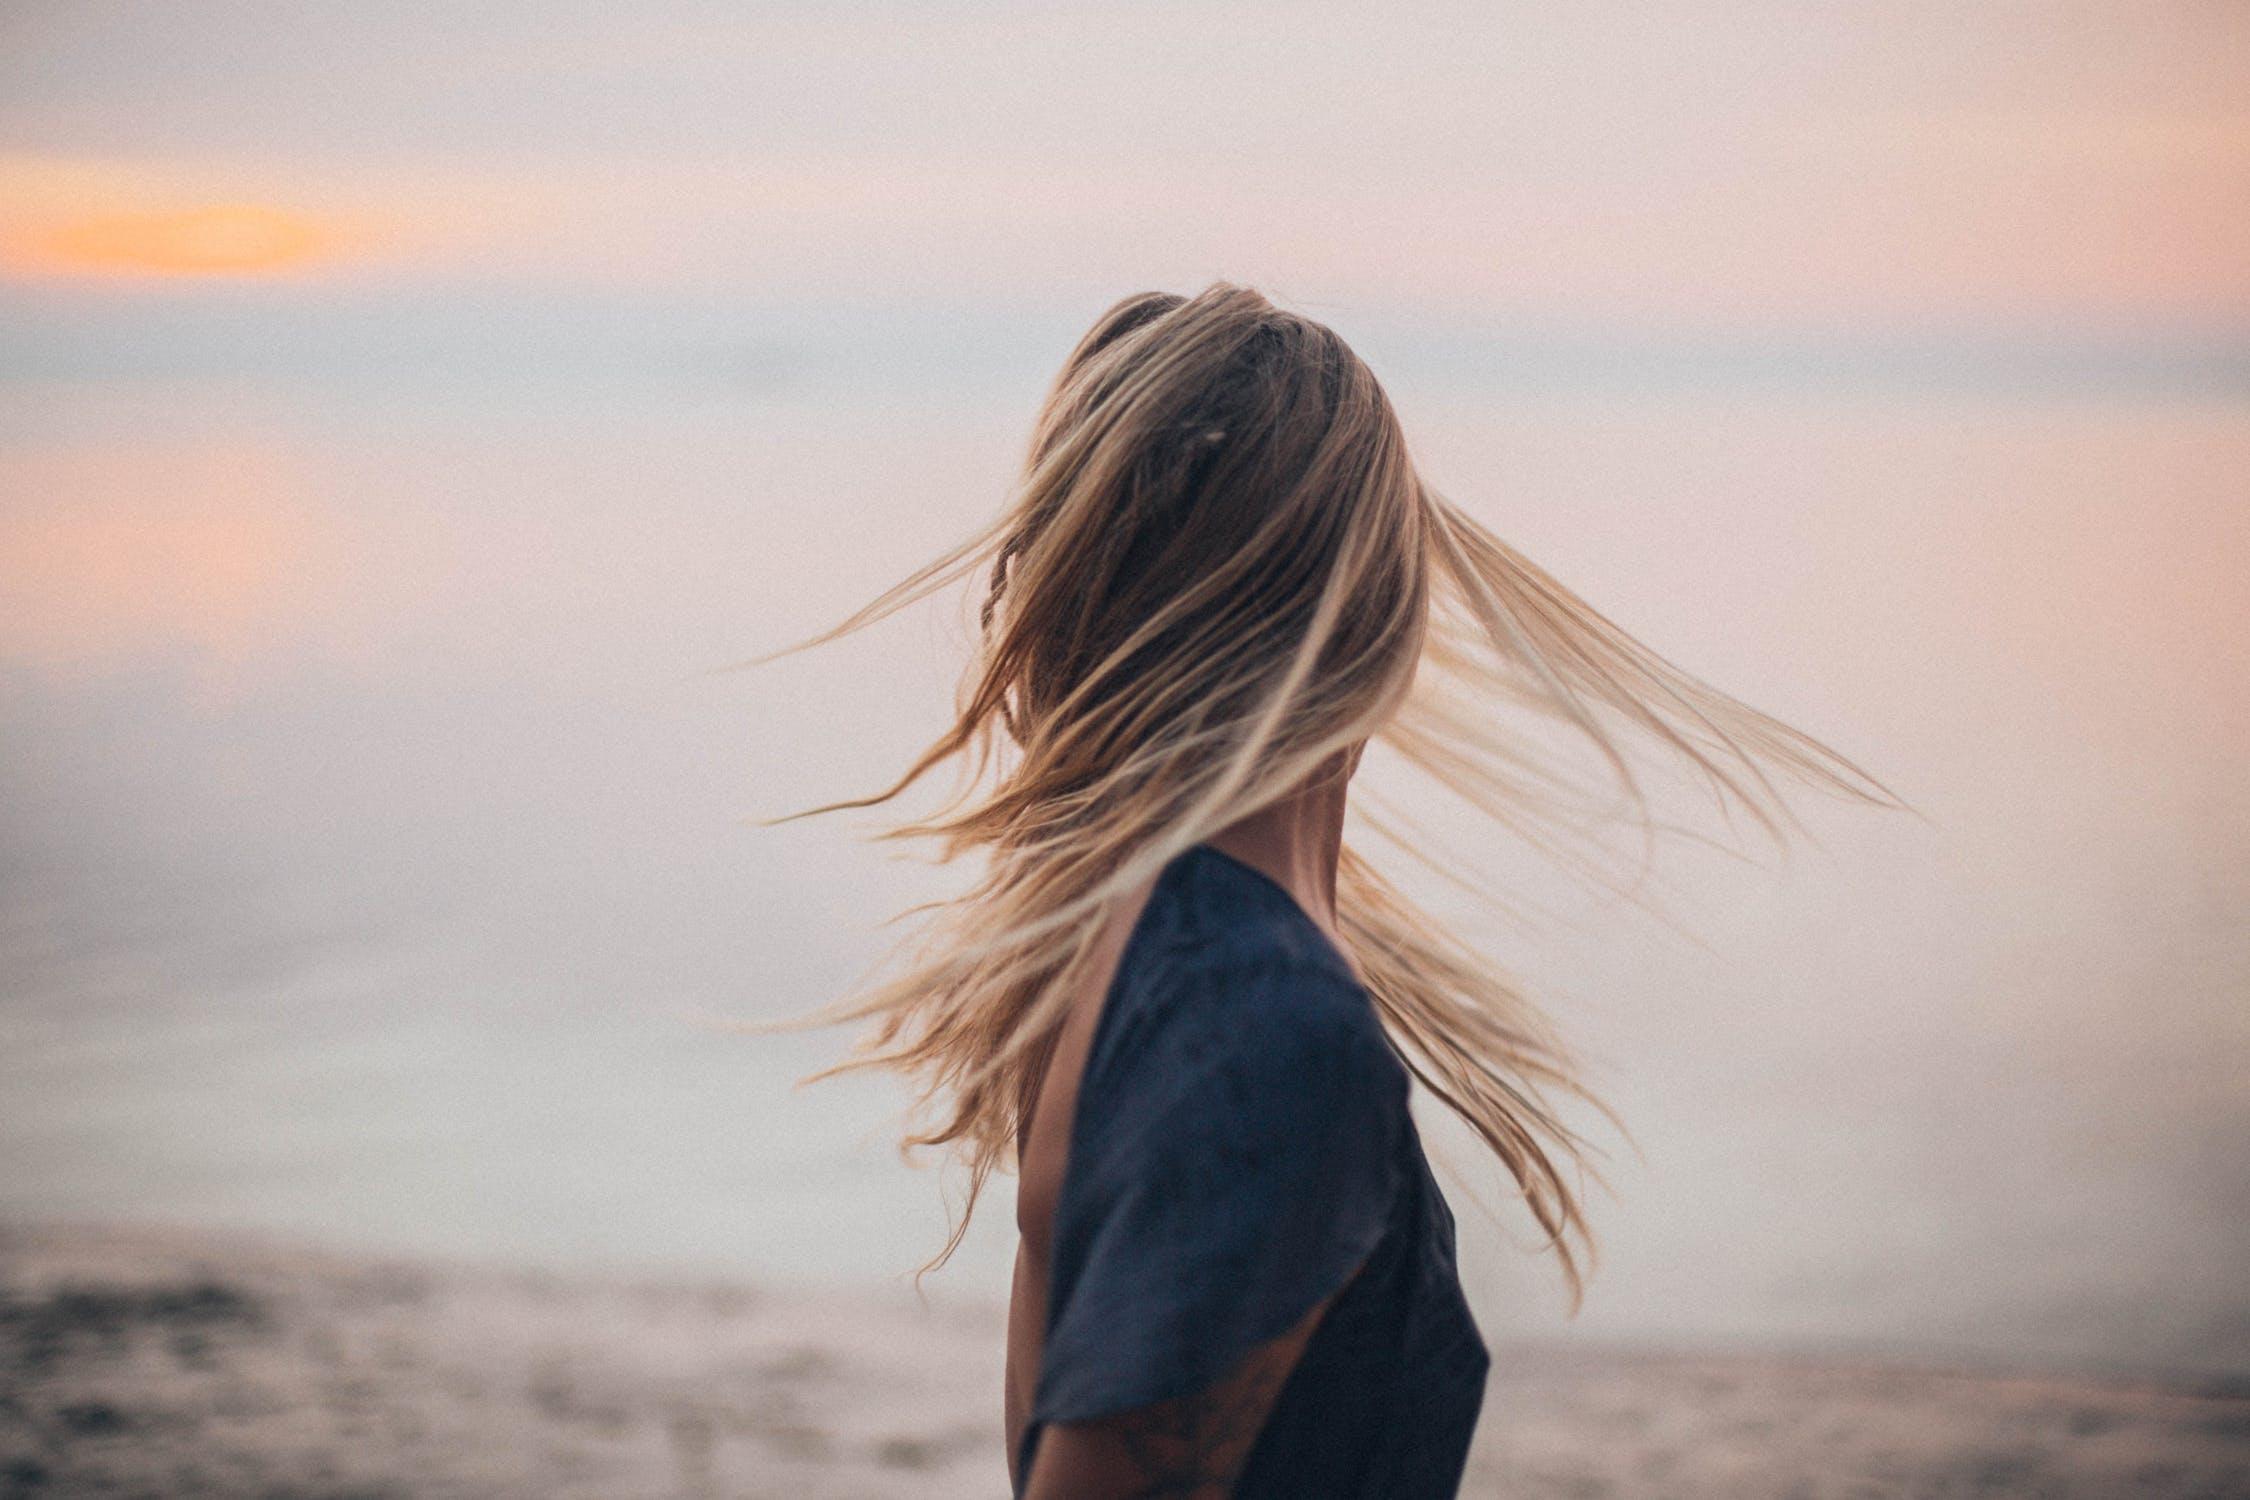 PRP (PLATELET-RICH PLASMA) FOR HAIR LOSS & RESTORATION -